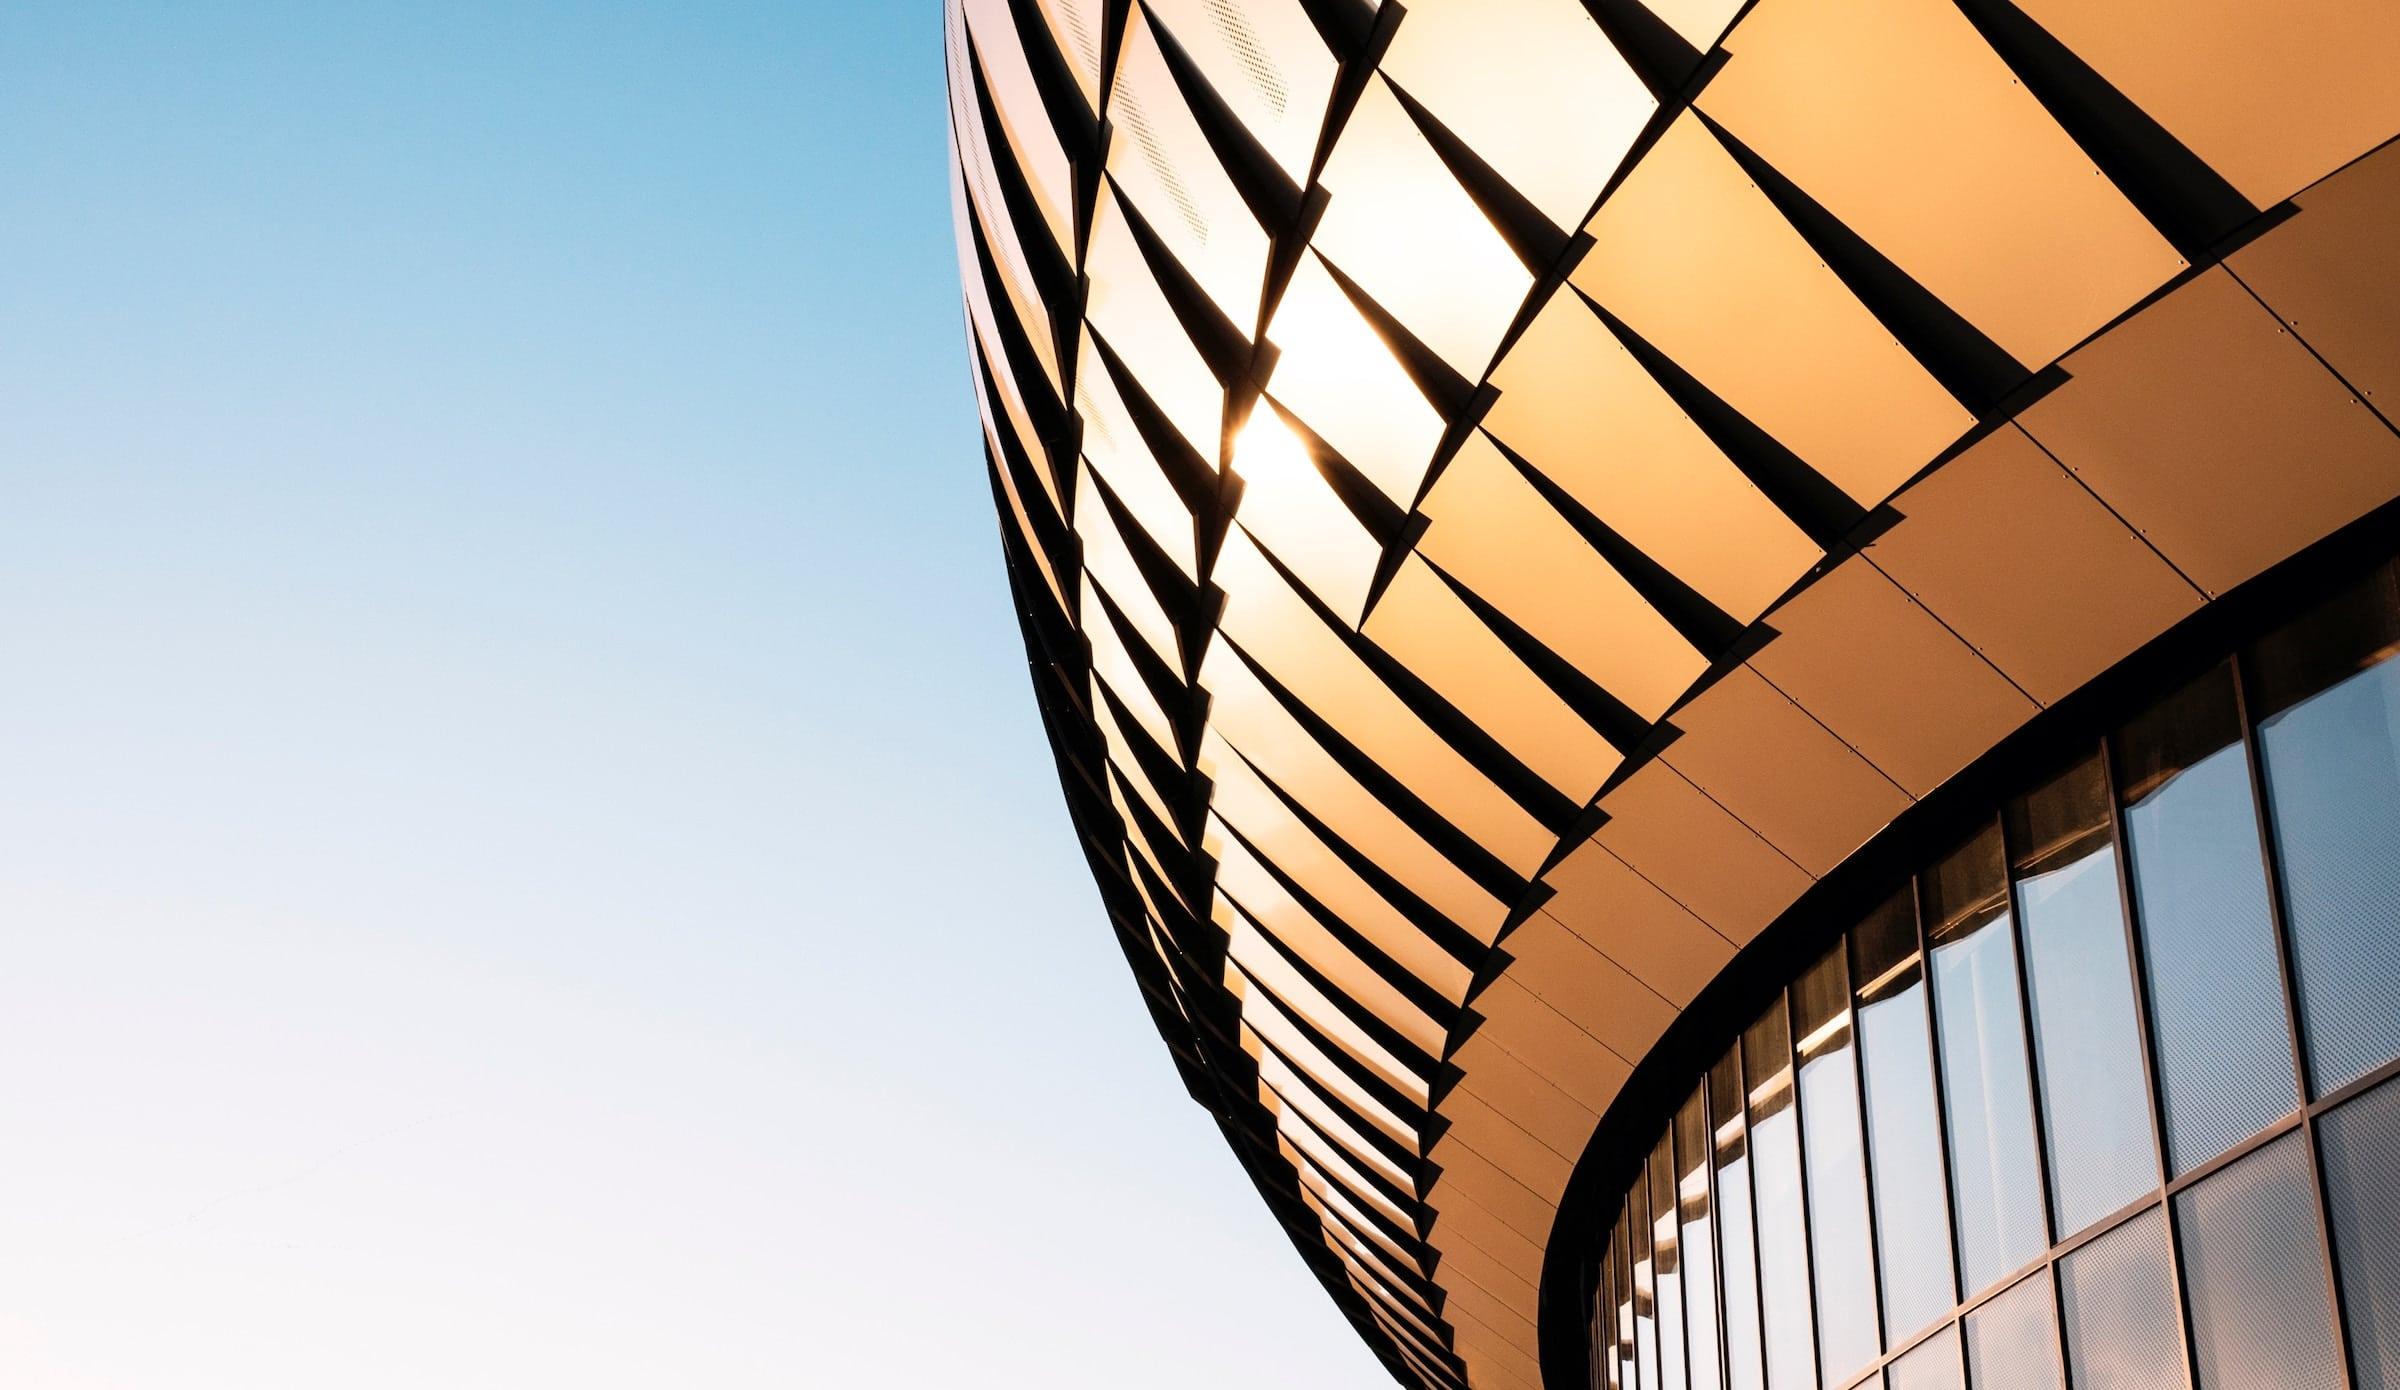 copper round building